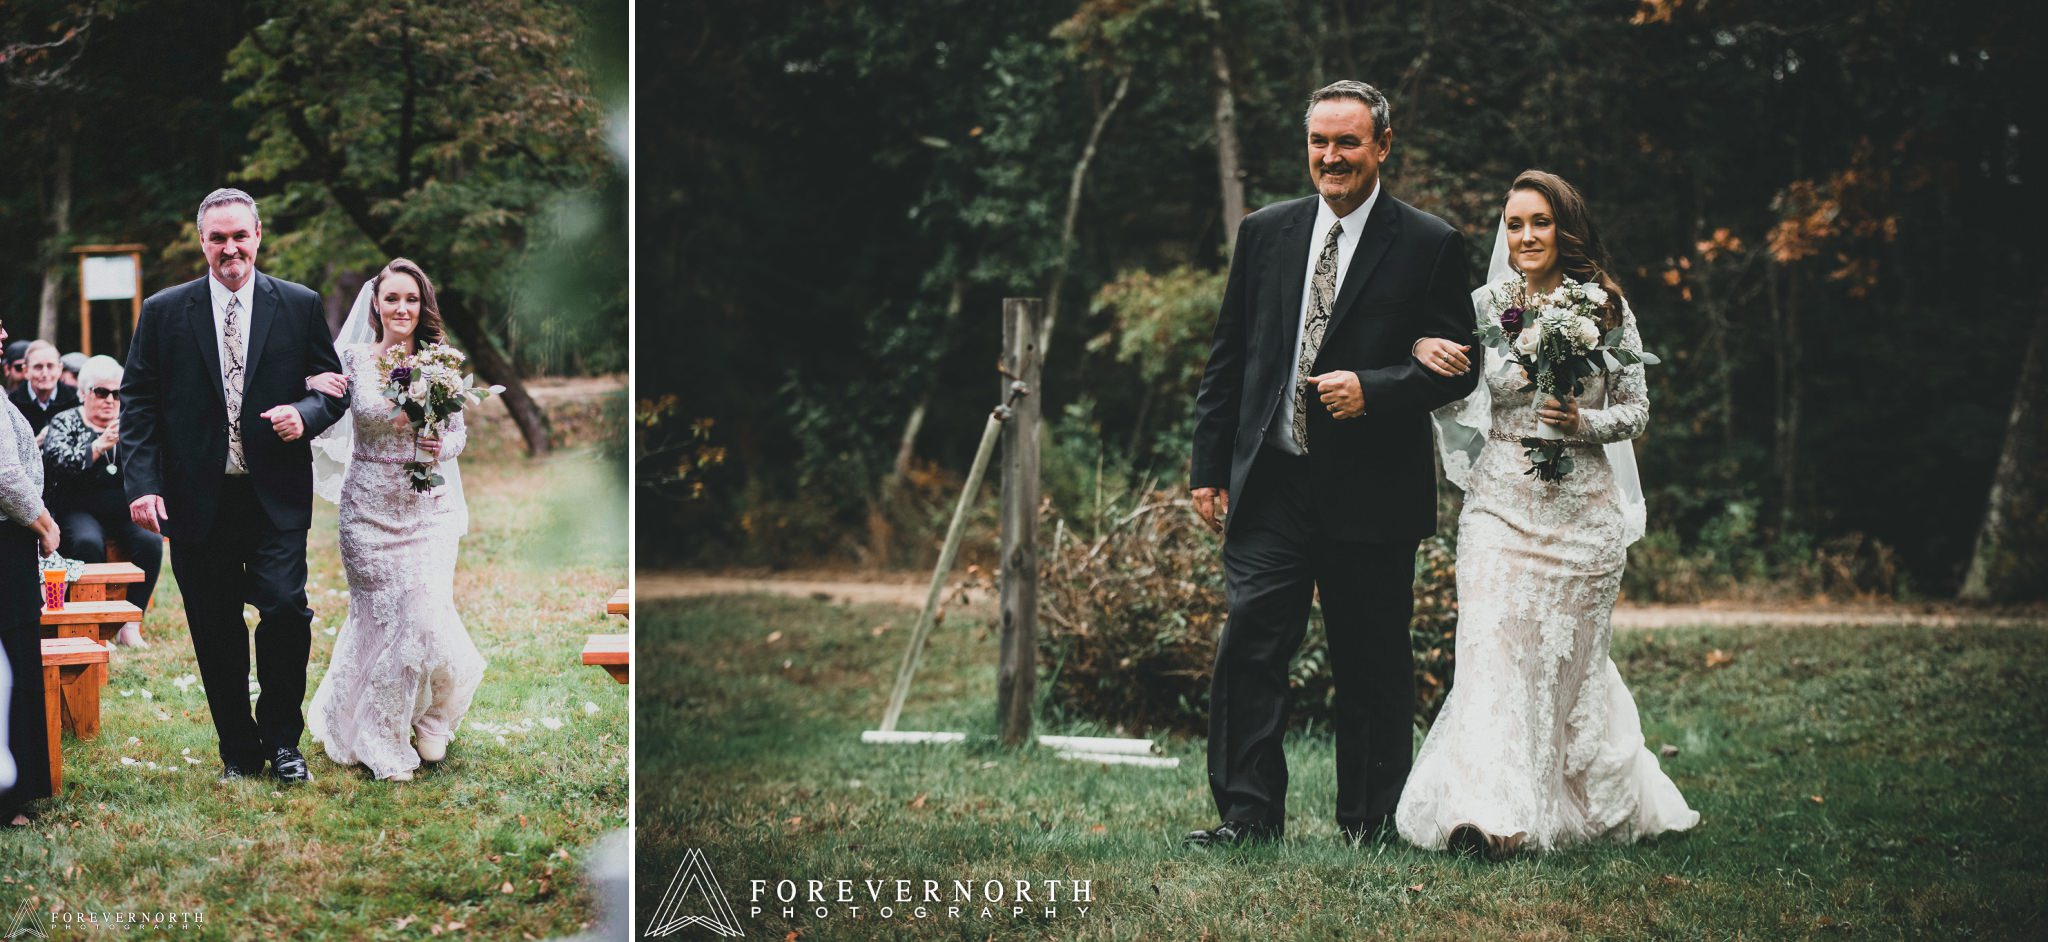 Perkins-Whitesbog-Village-Wedding-Photographer-42.JPG